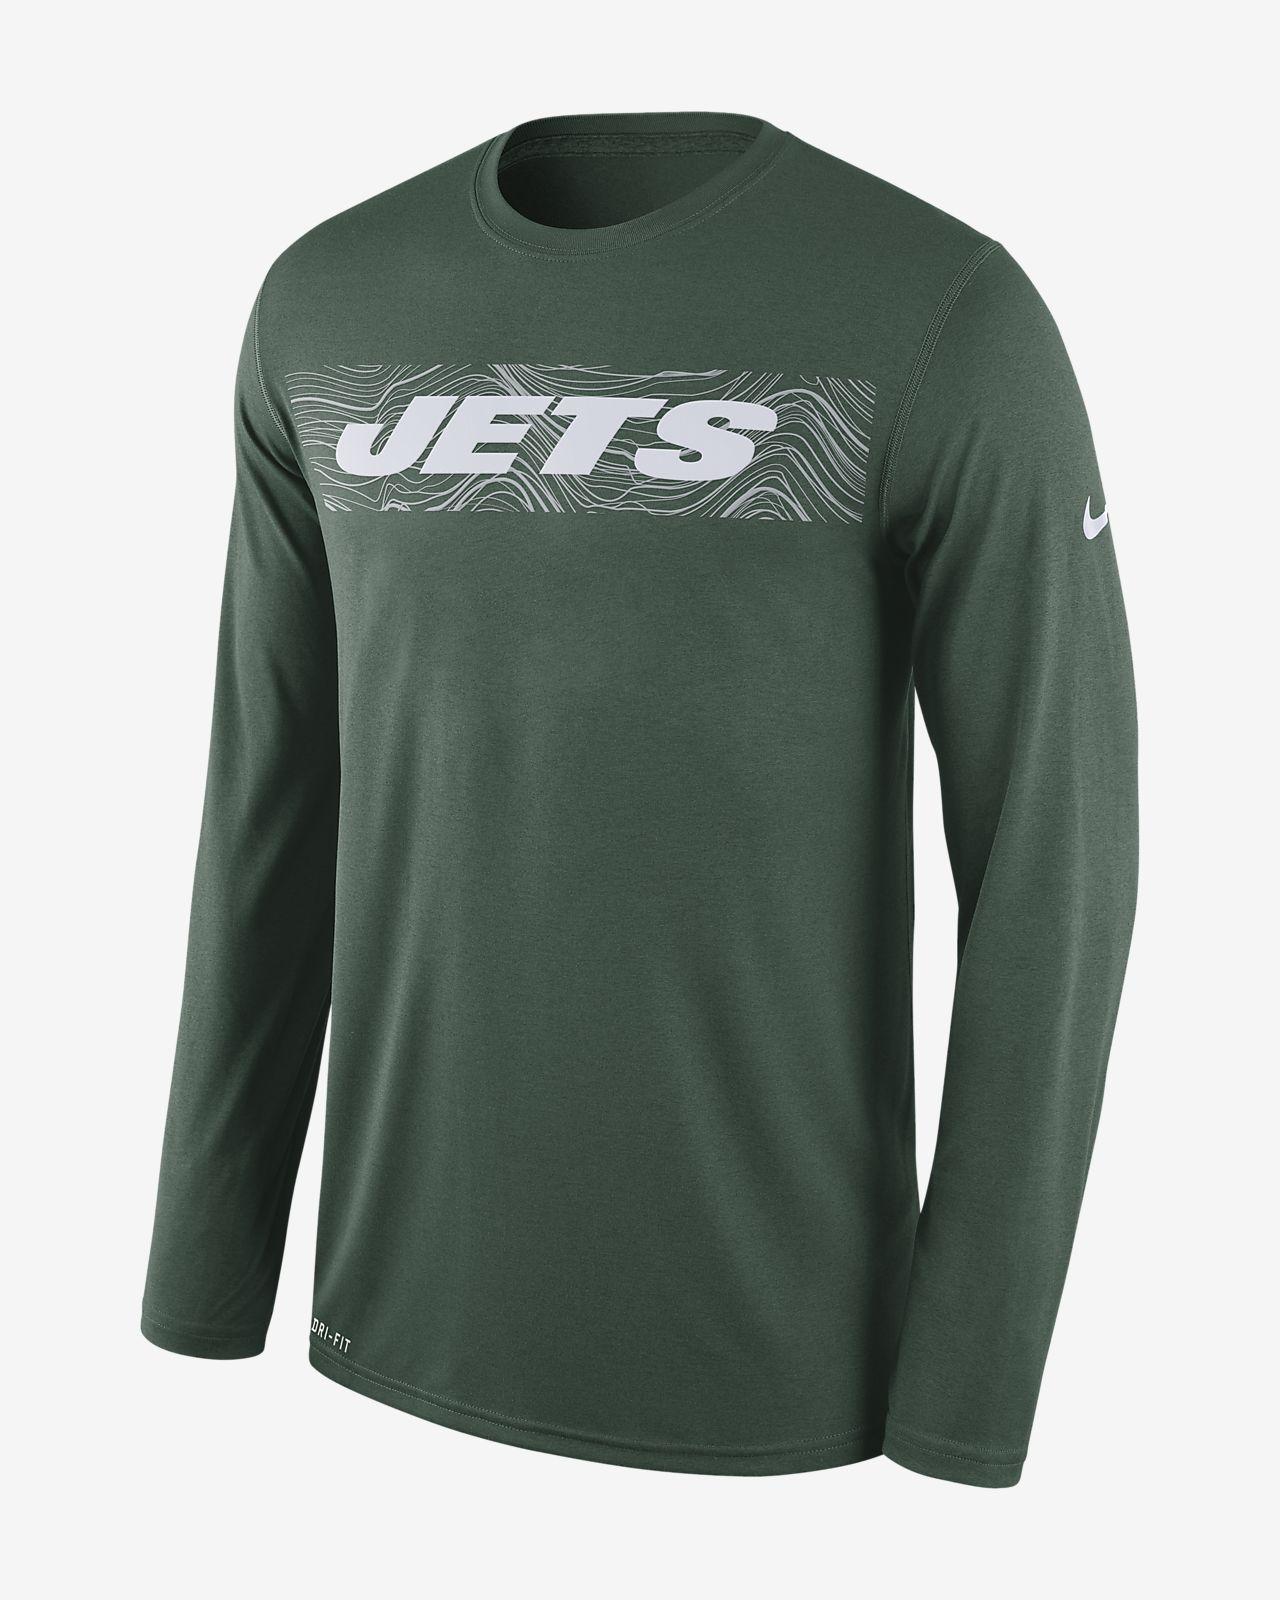 Nike Dri-FIT Legend Seismic (NFL Jets) Men s Long Sleeve T-Shirt ... f52c69d80